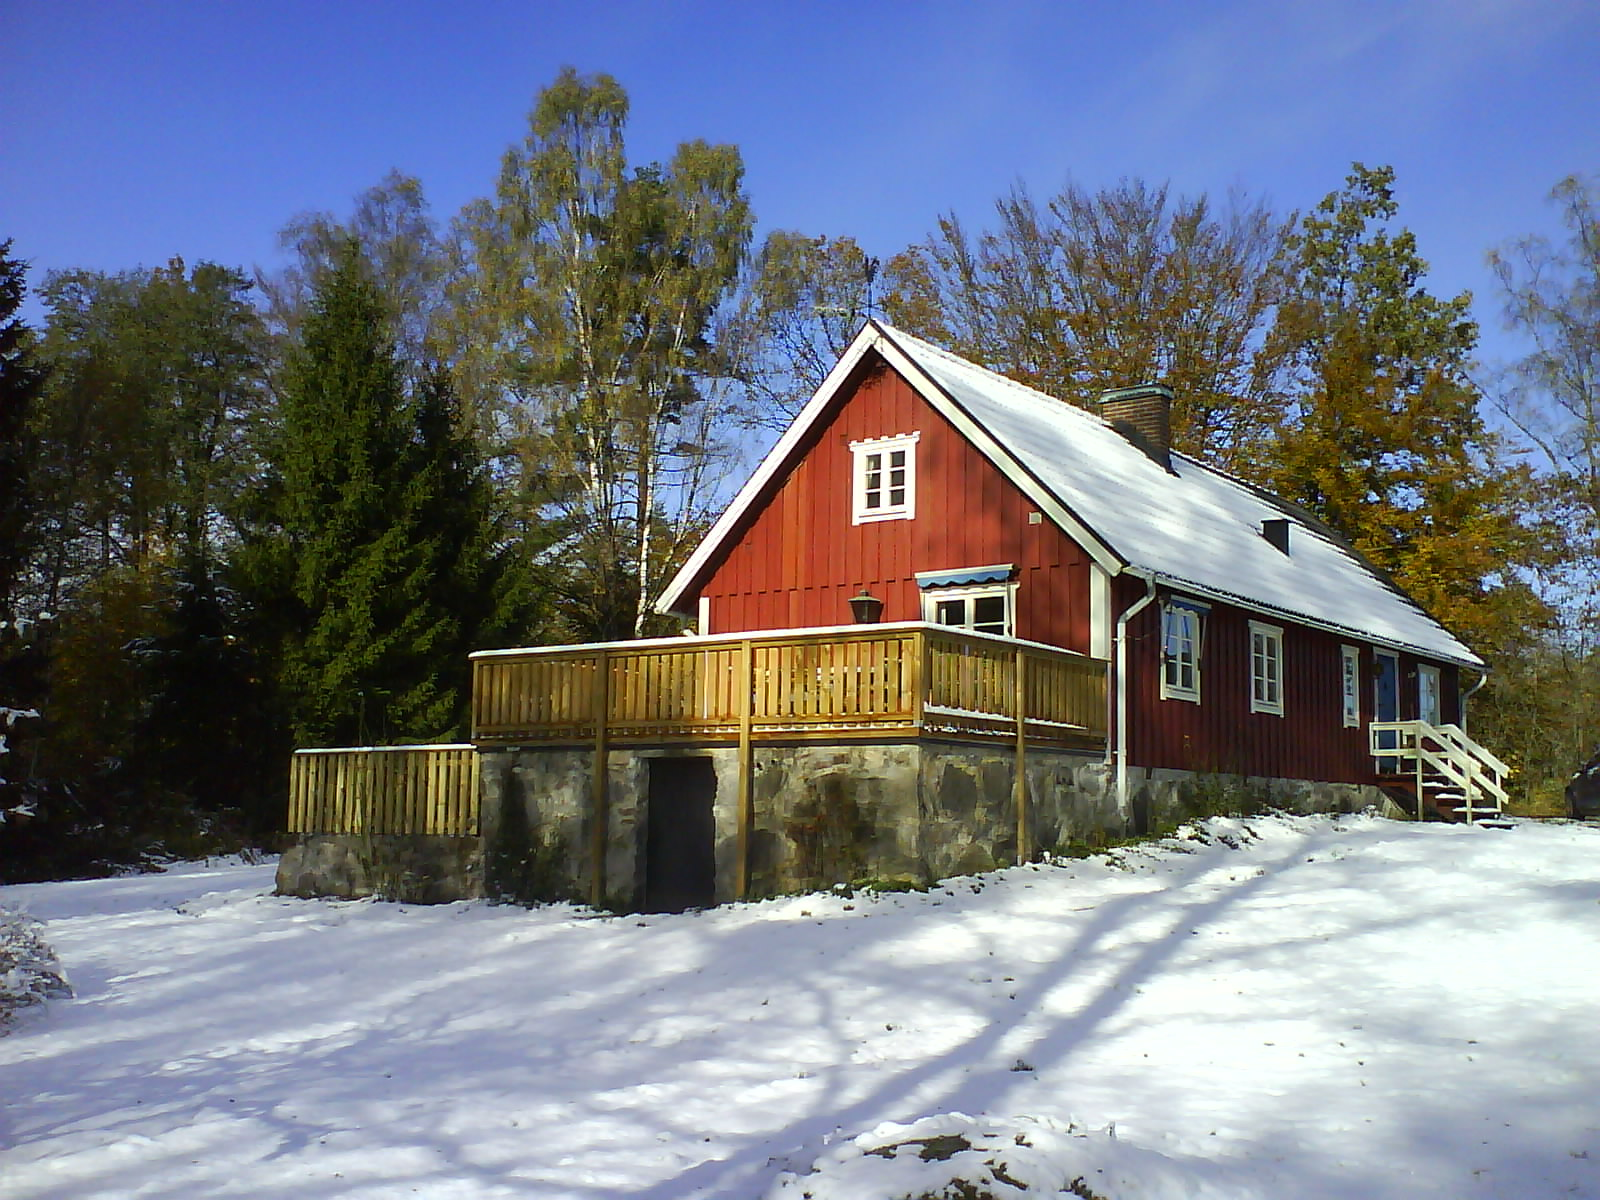 vånga dating sweden svenljunga träffa singlar